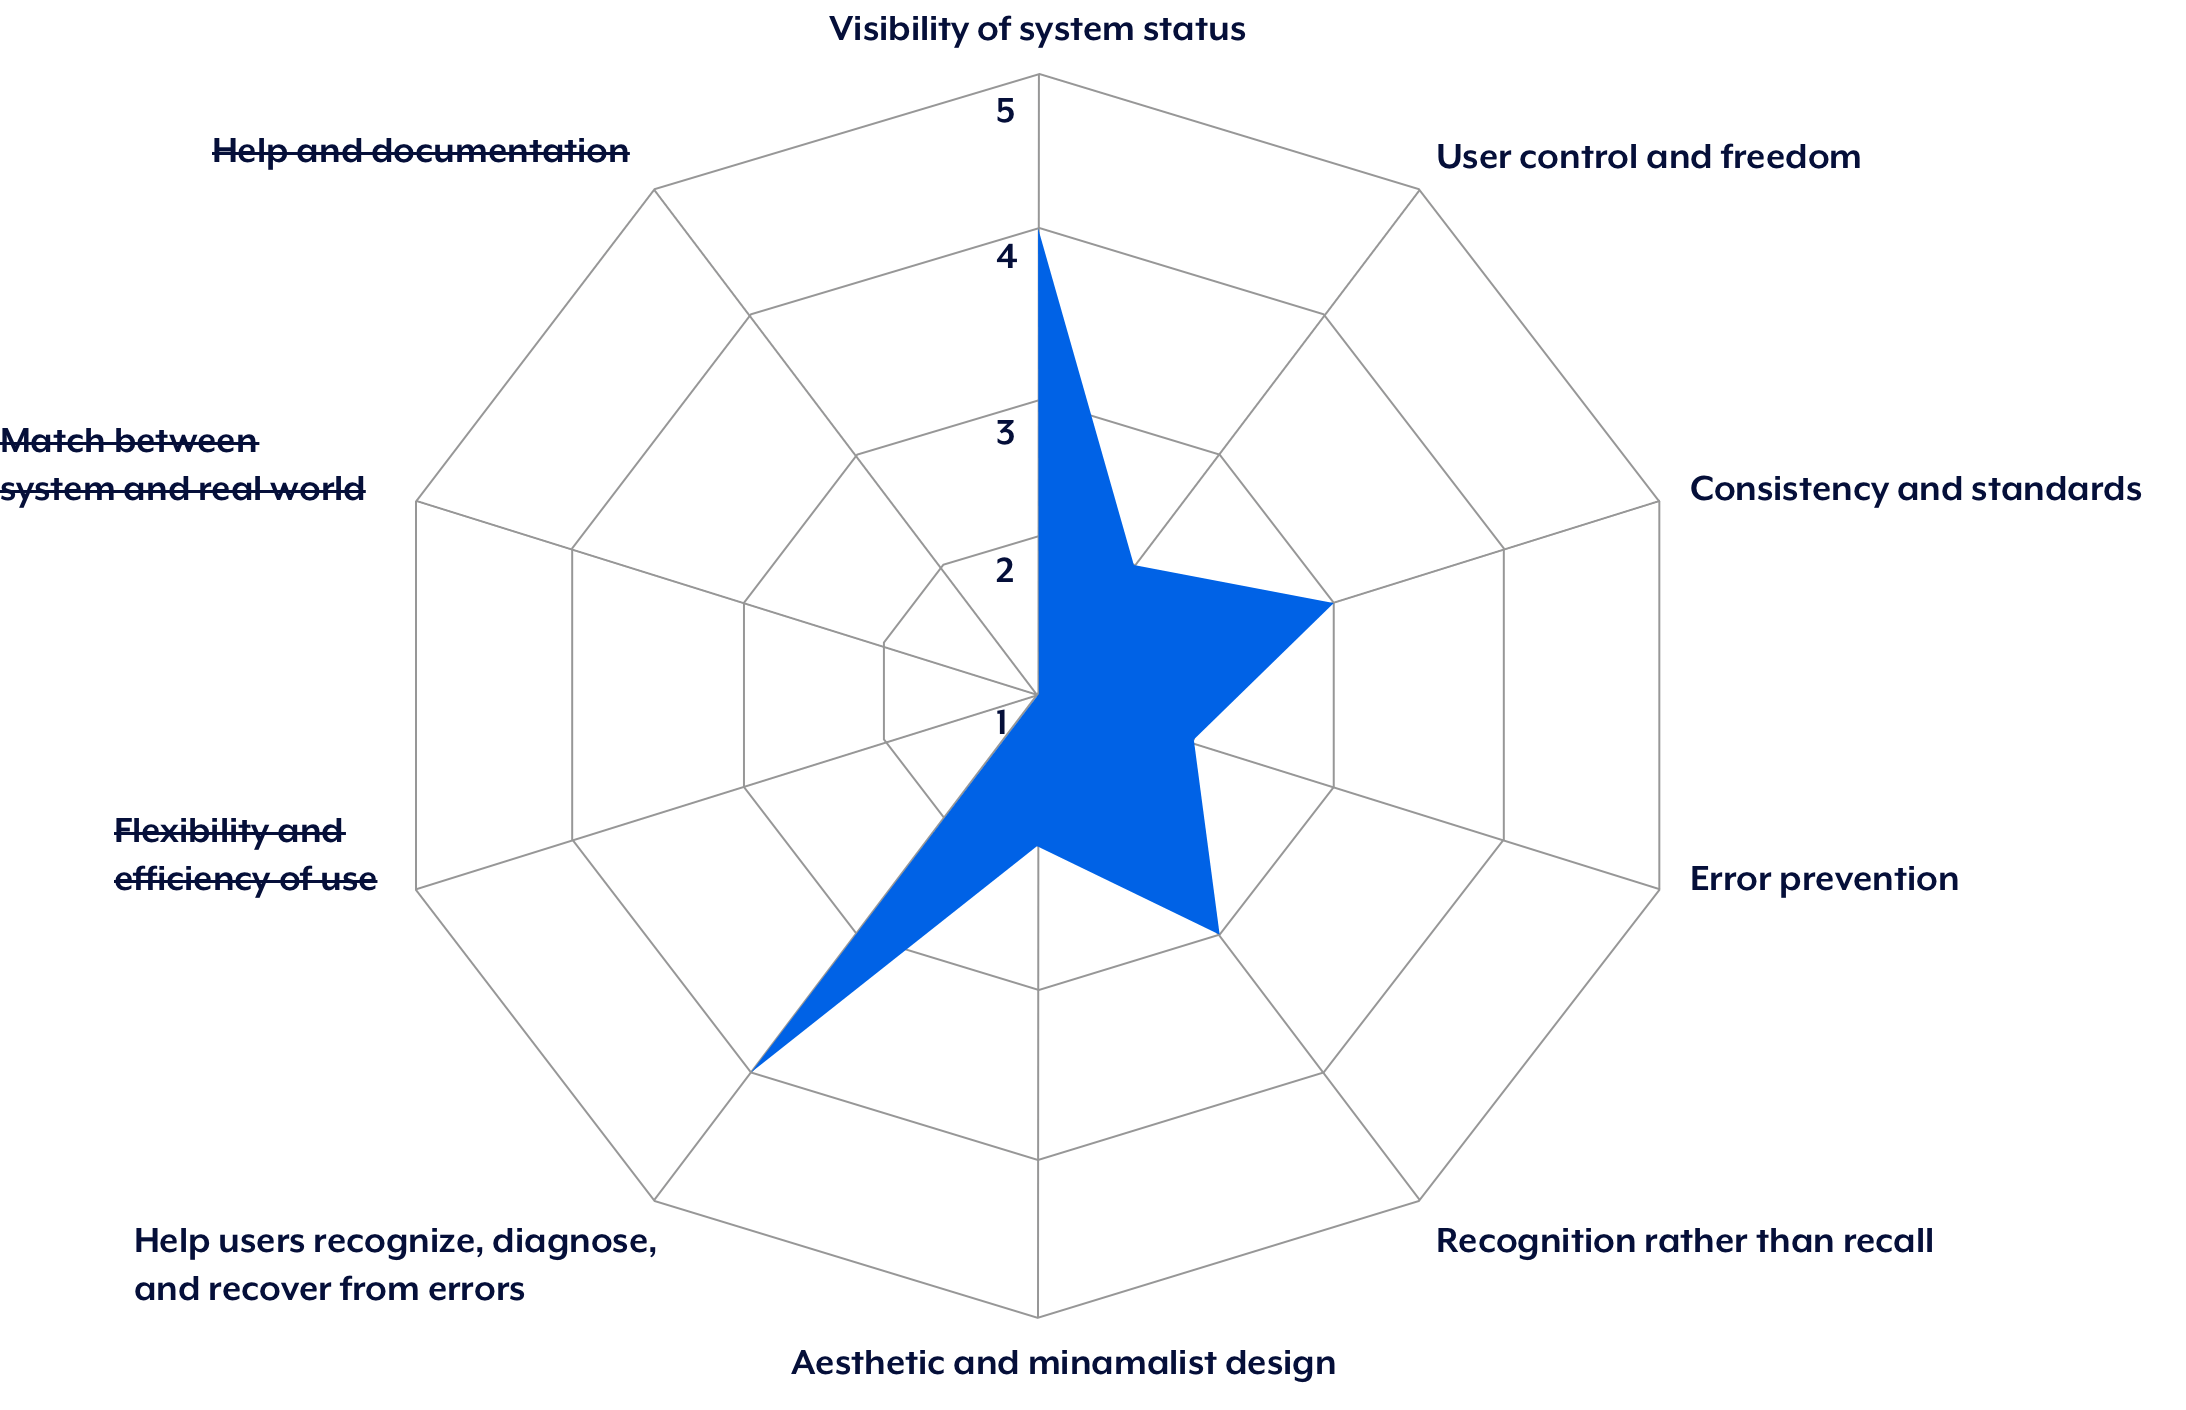 Heuristic Evaluation Score Summary